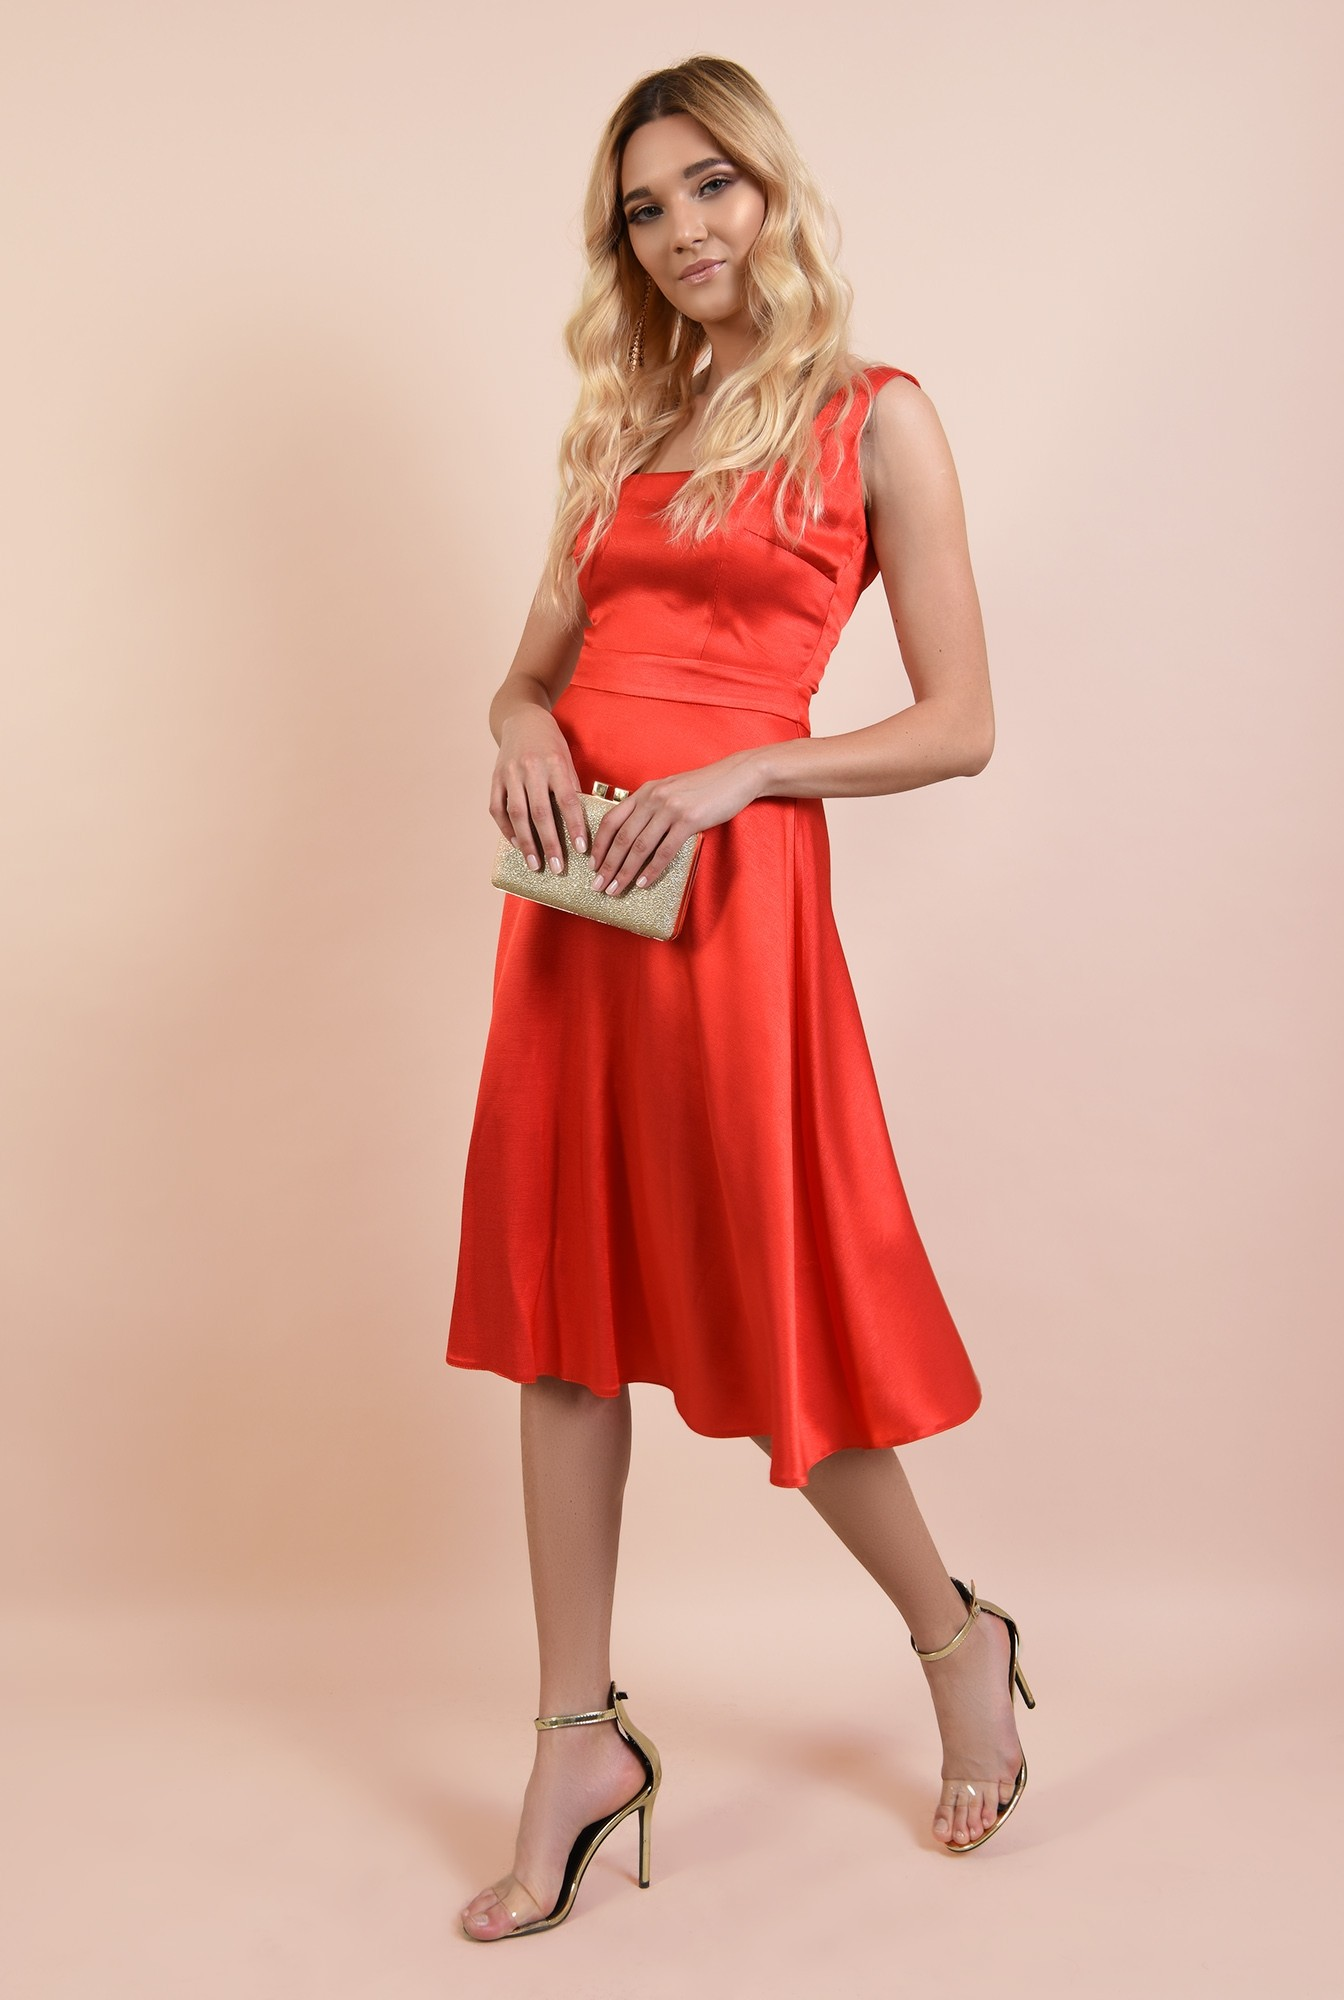 3 - rochie de ocazie, Poema, corai, cu bretele, evazata, rochii online